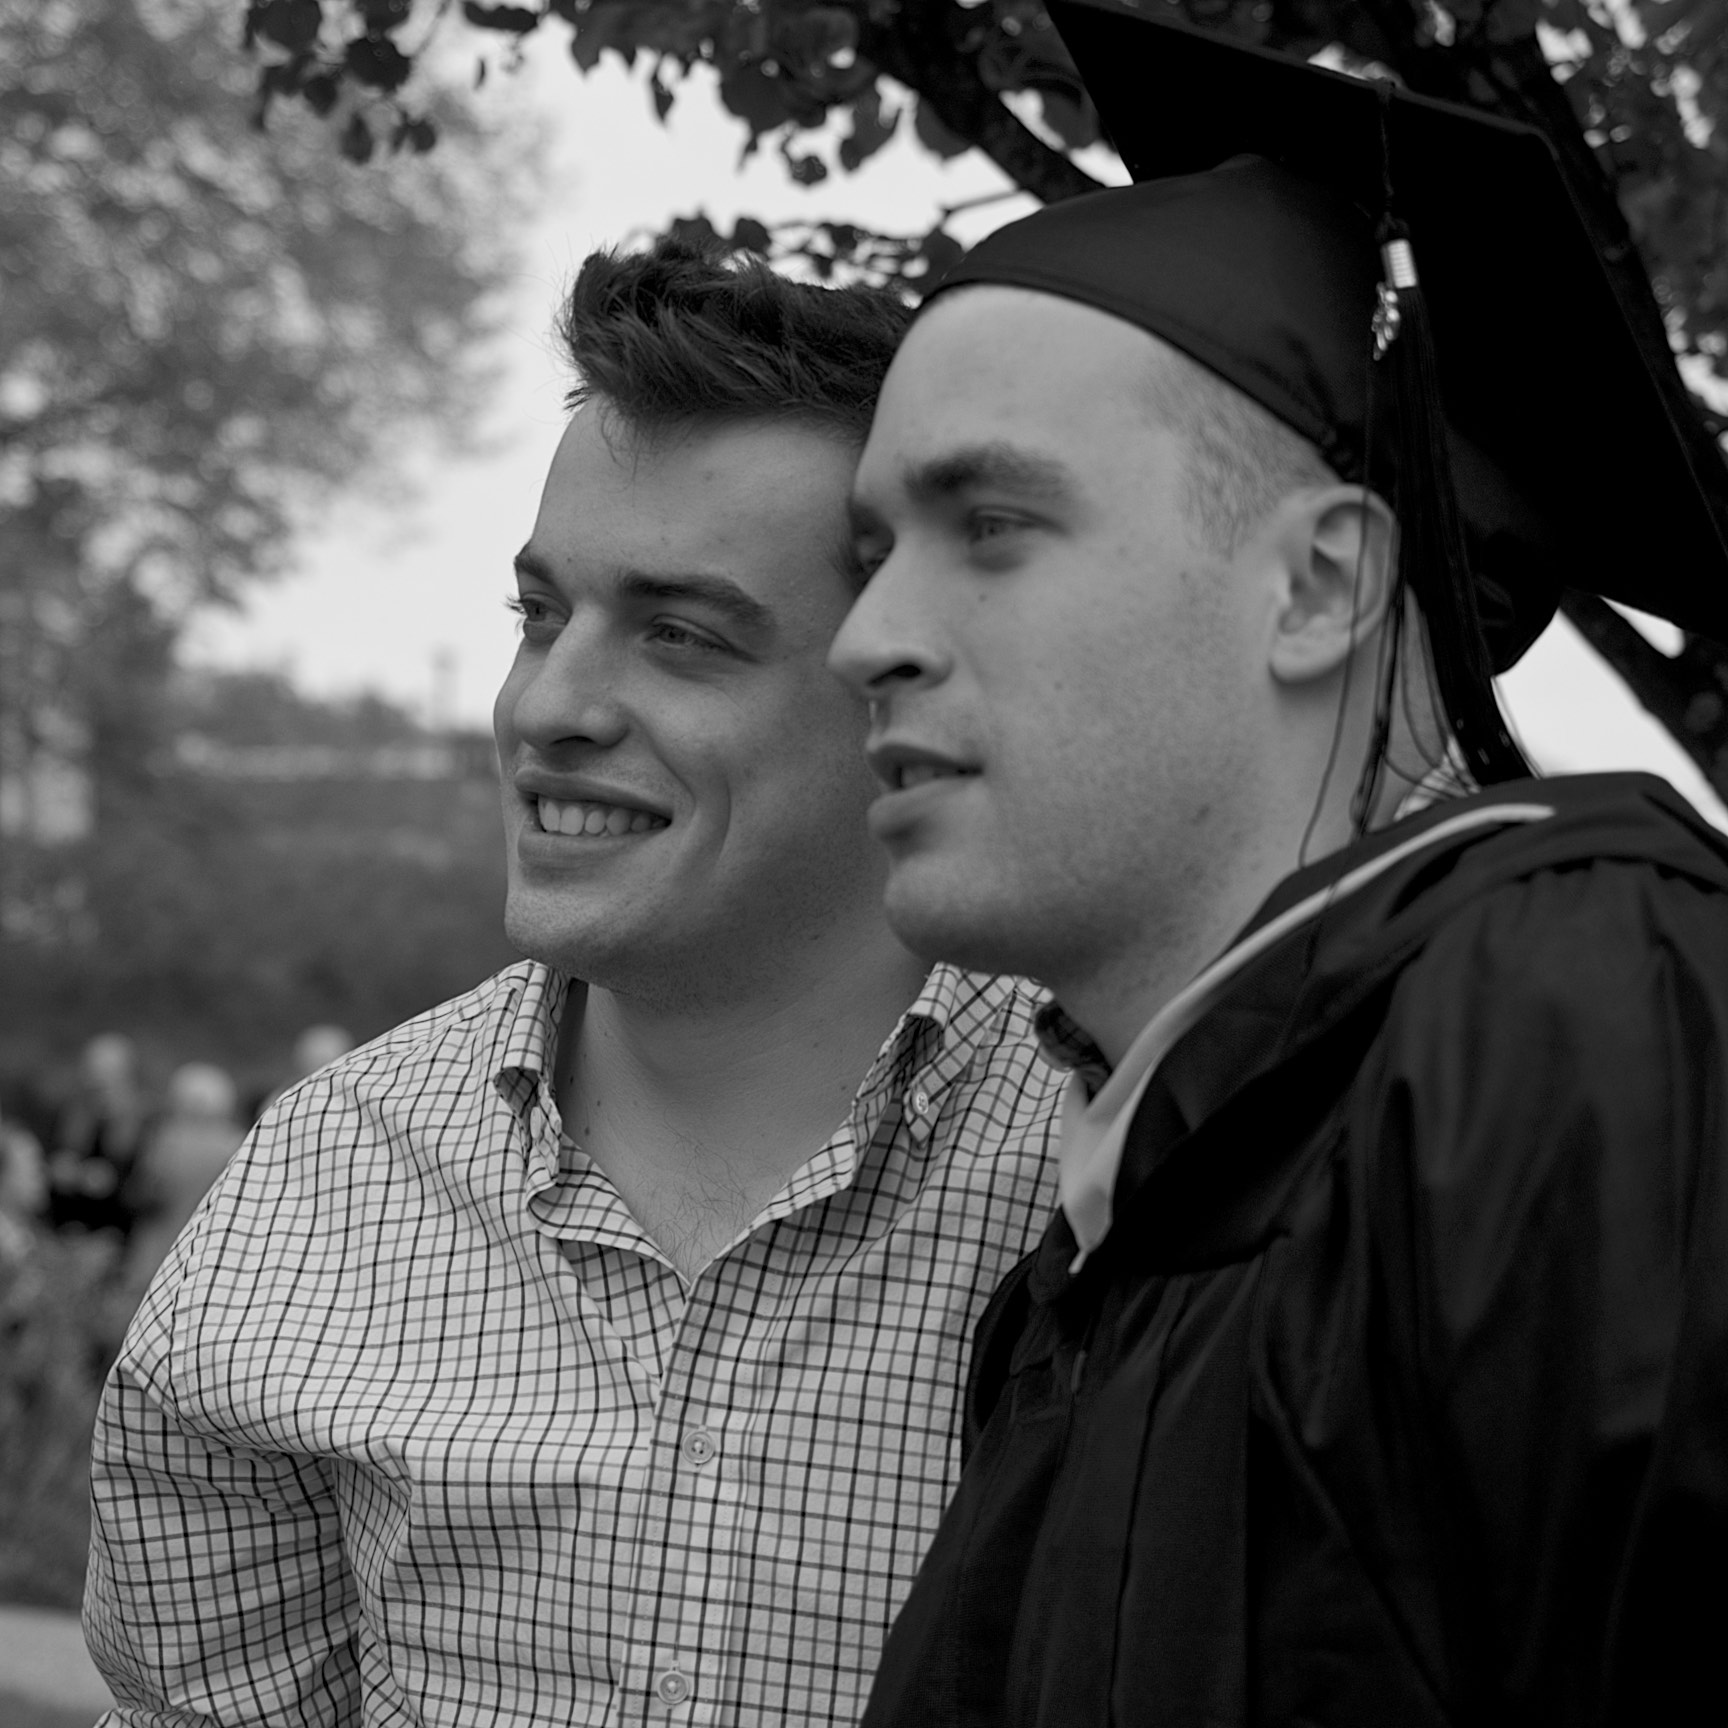 zach_graduation_P5210206.jpg